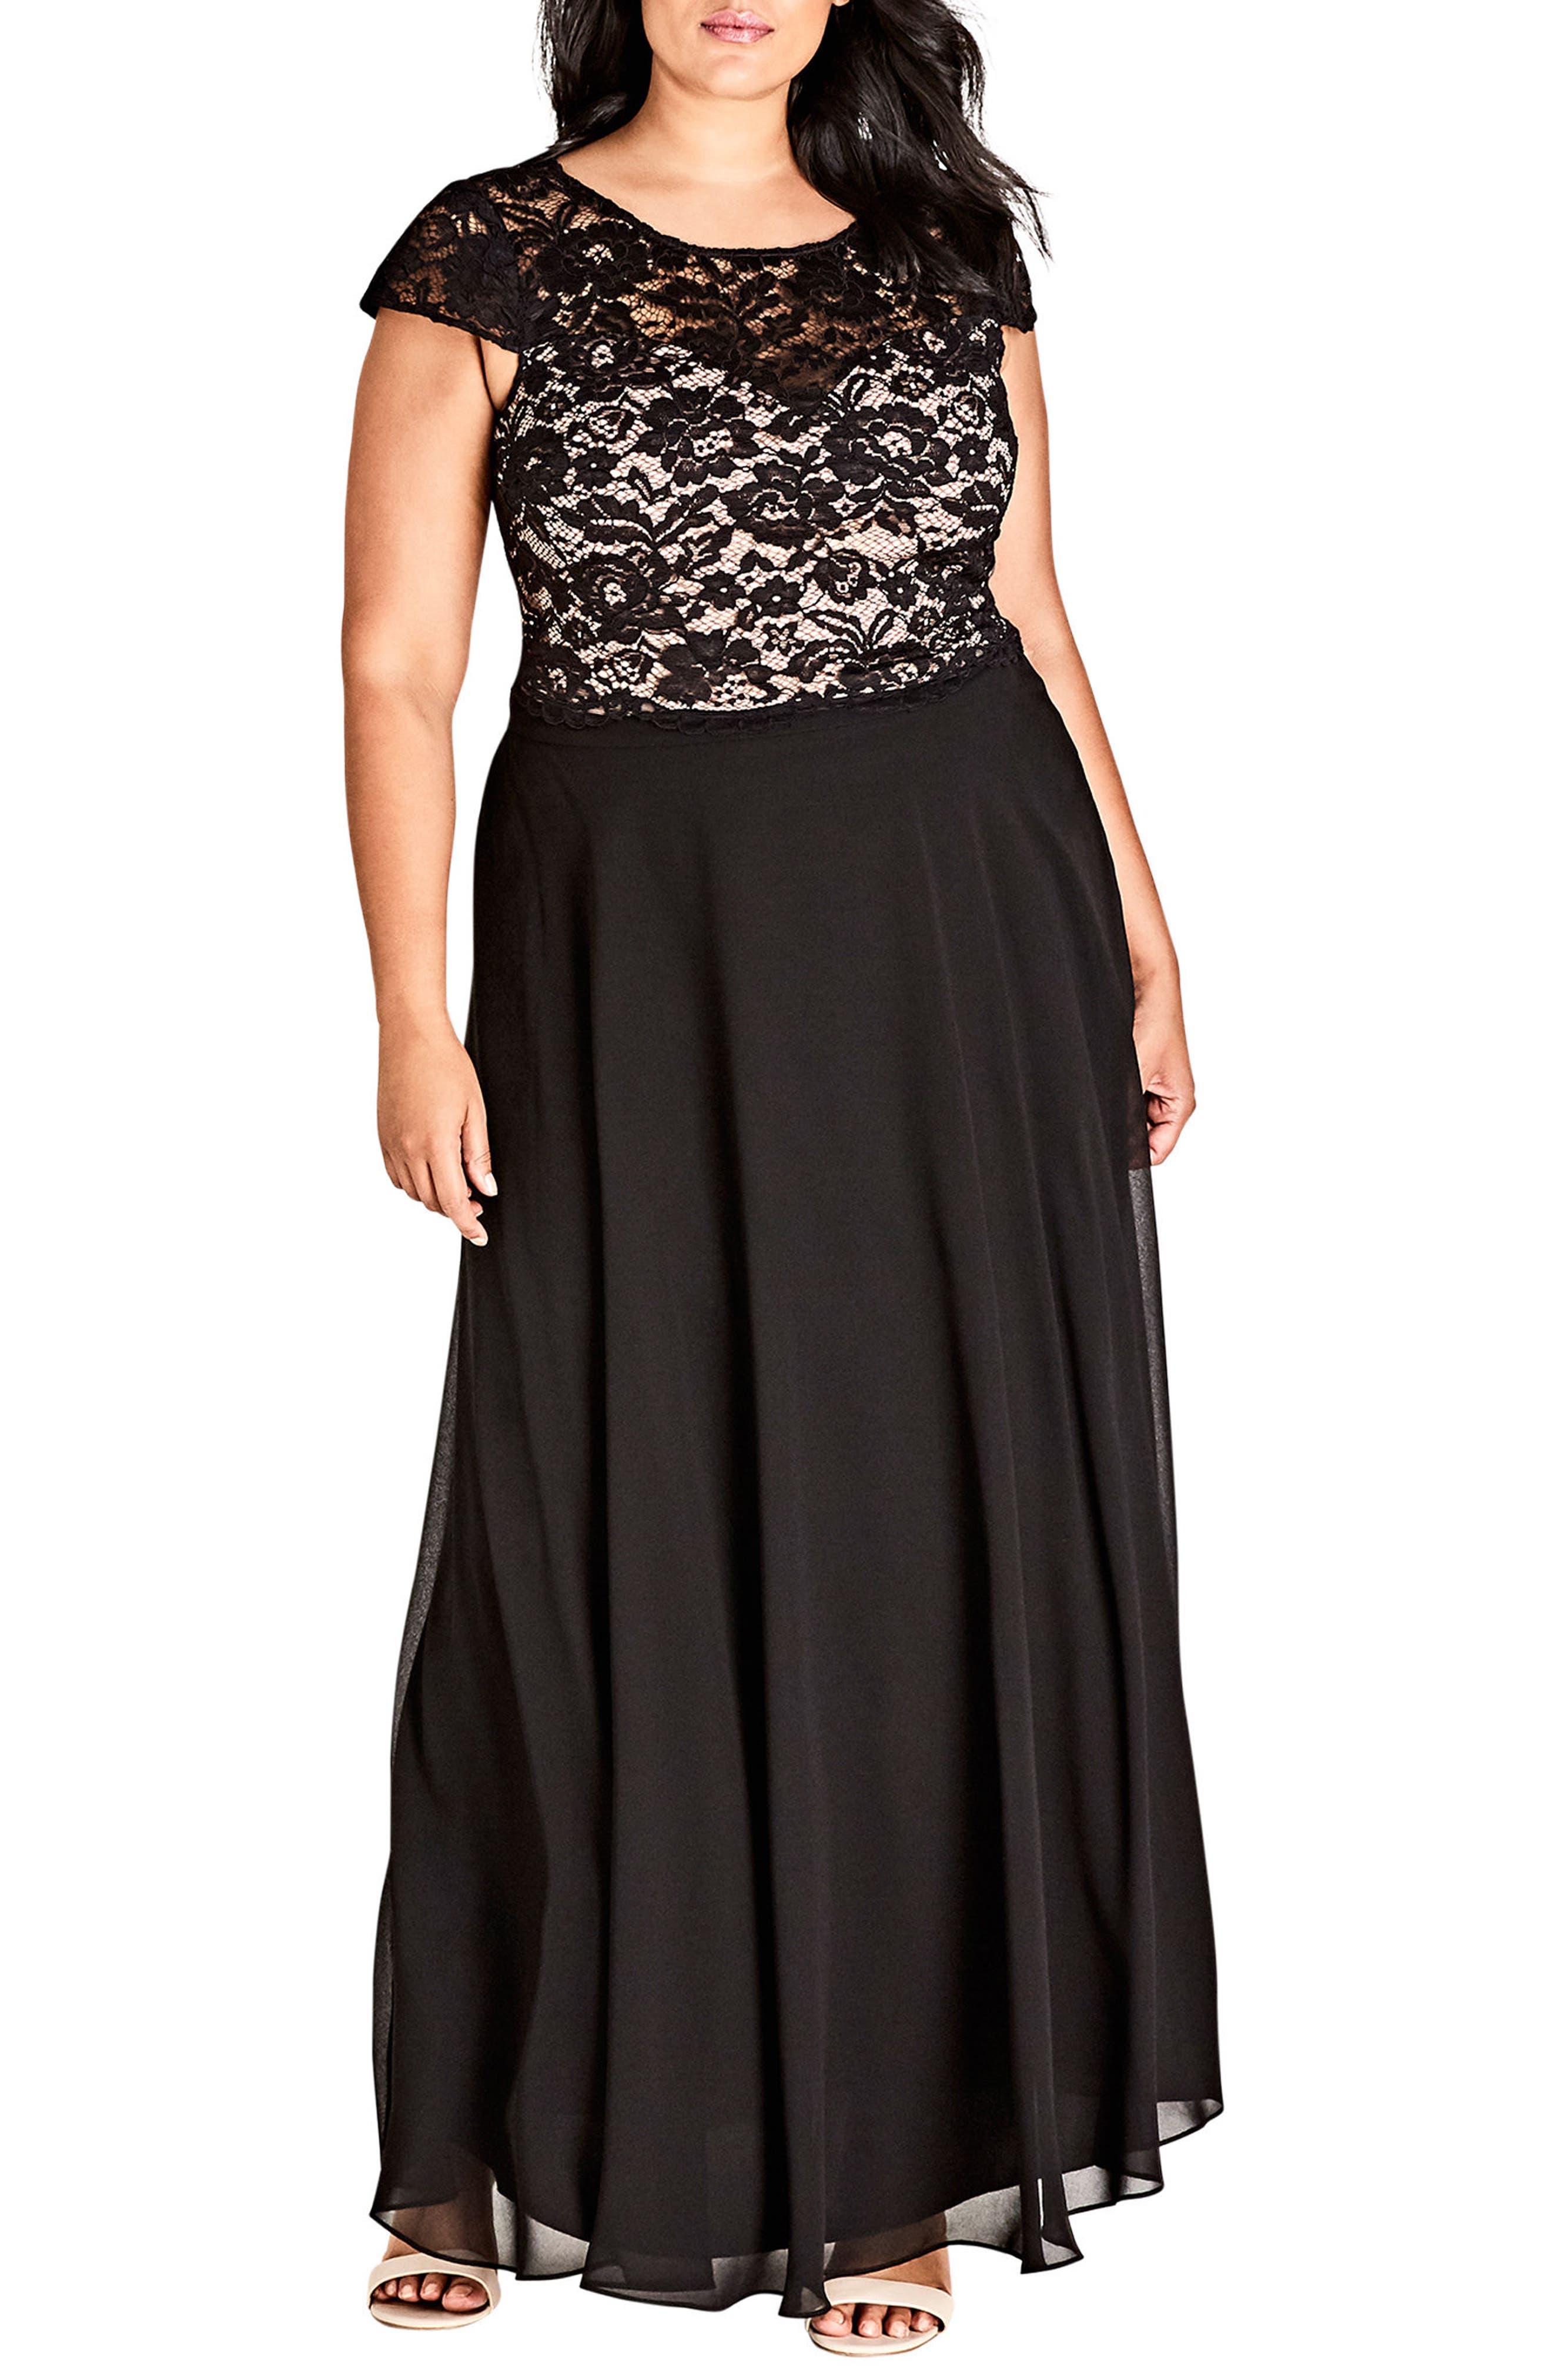 Alternate Image 1 Selected - City Chic Elegance Maxi Dress Set (Plus Size)